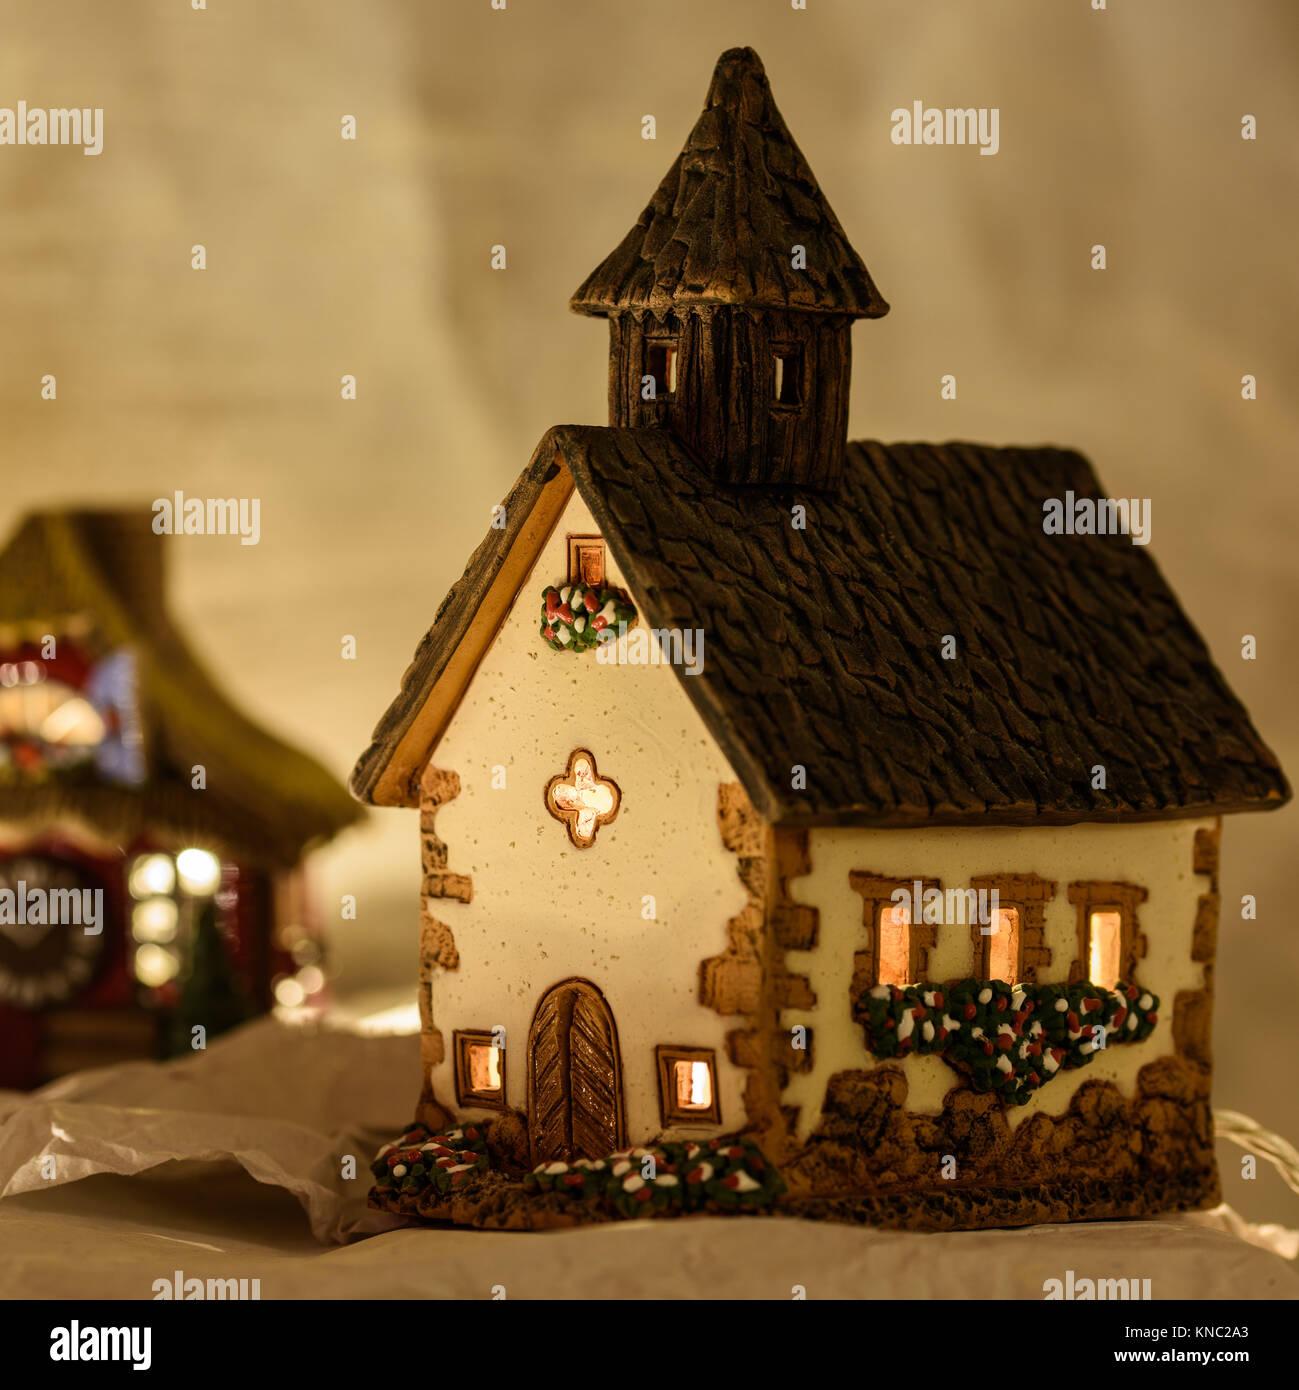 ceramic christmas houses nativity stock image - Ceramic Christmas Houses